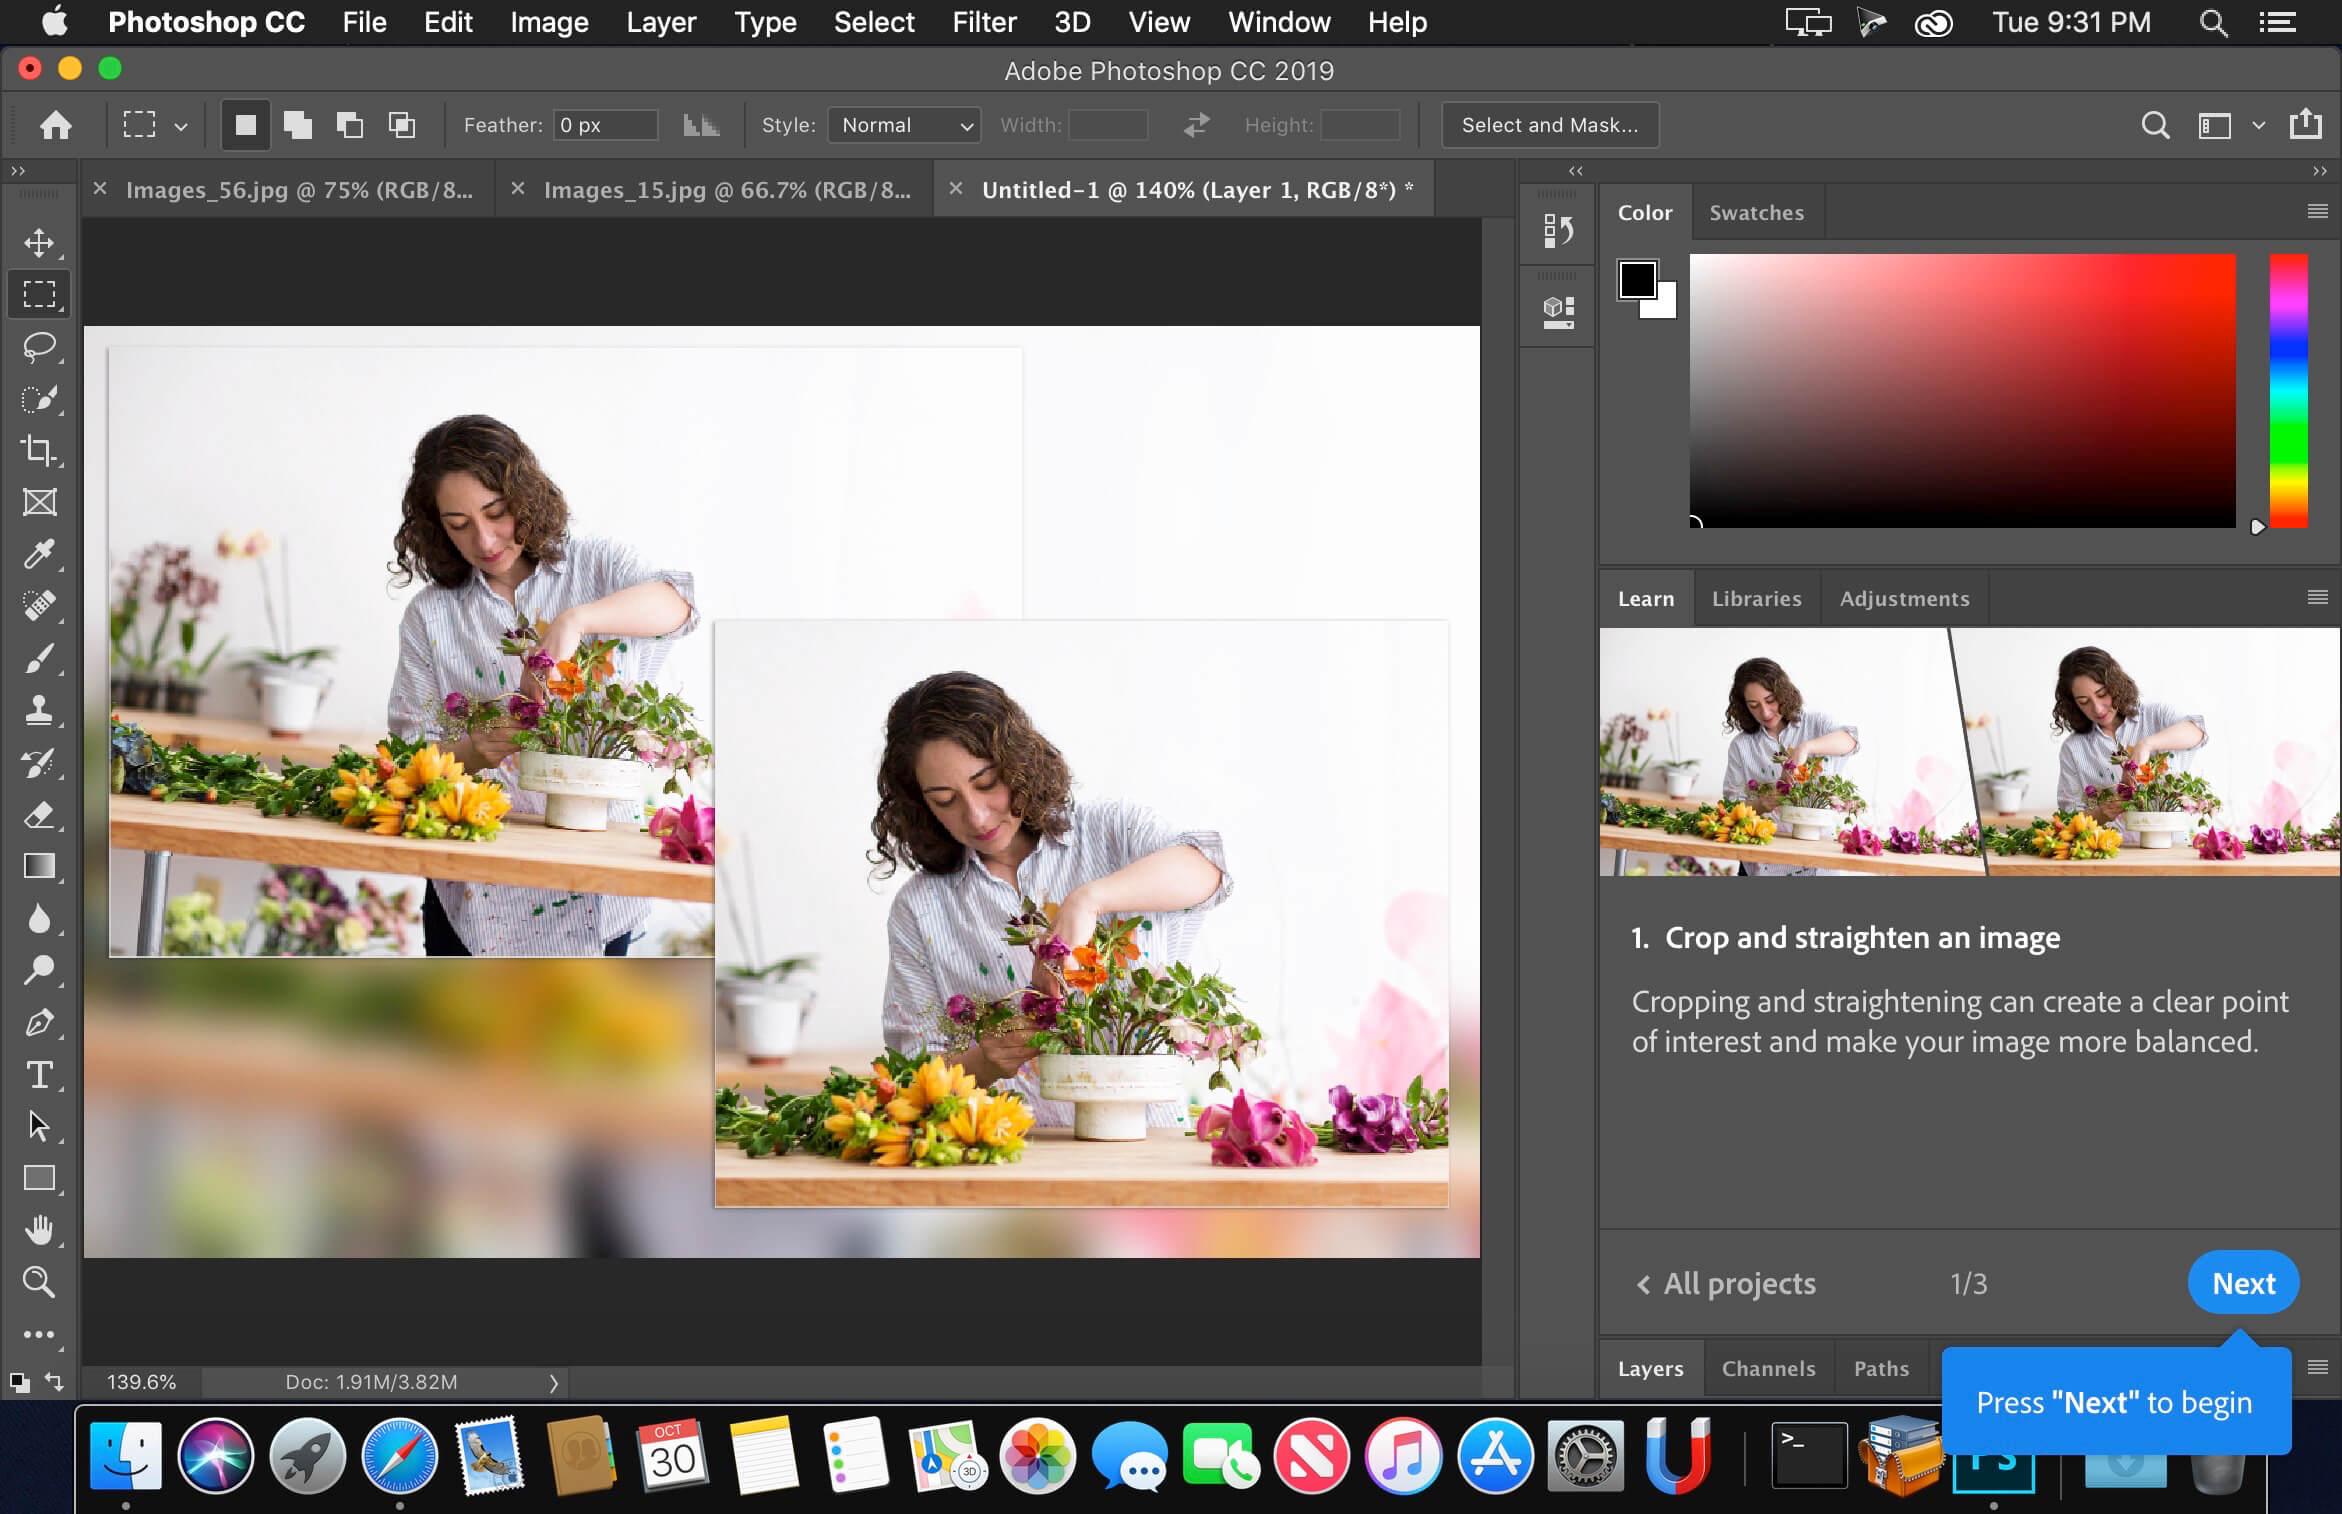 Adobe Photoshop CC 2019 v20 0 6 download | macOS